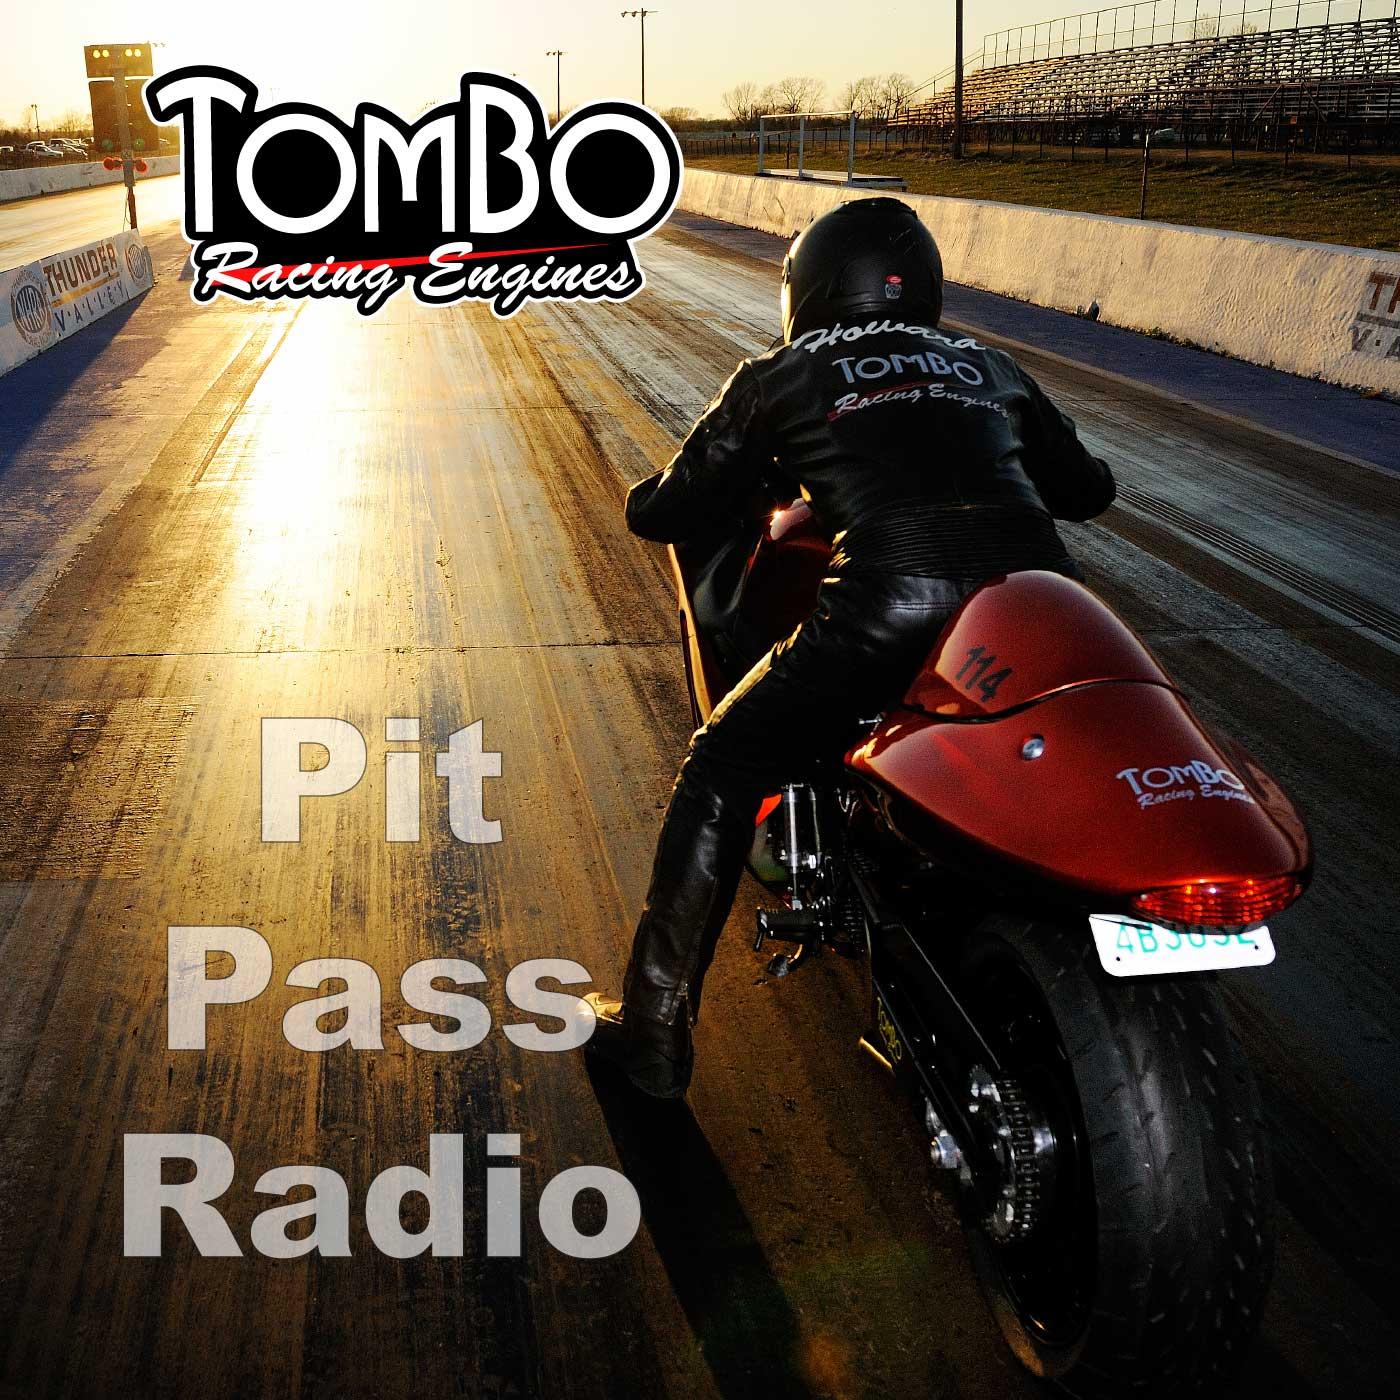 Tombo Racing Pit Pass Radio